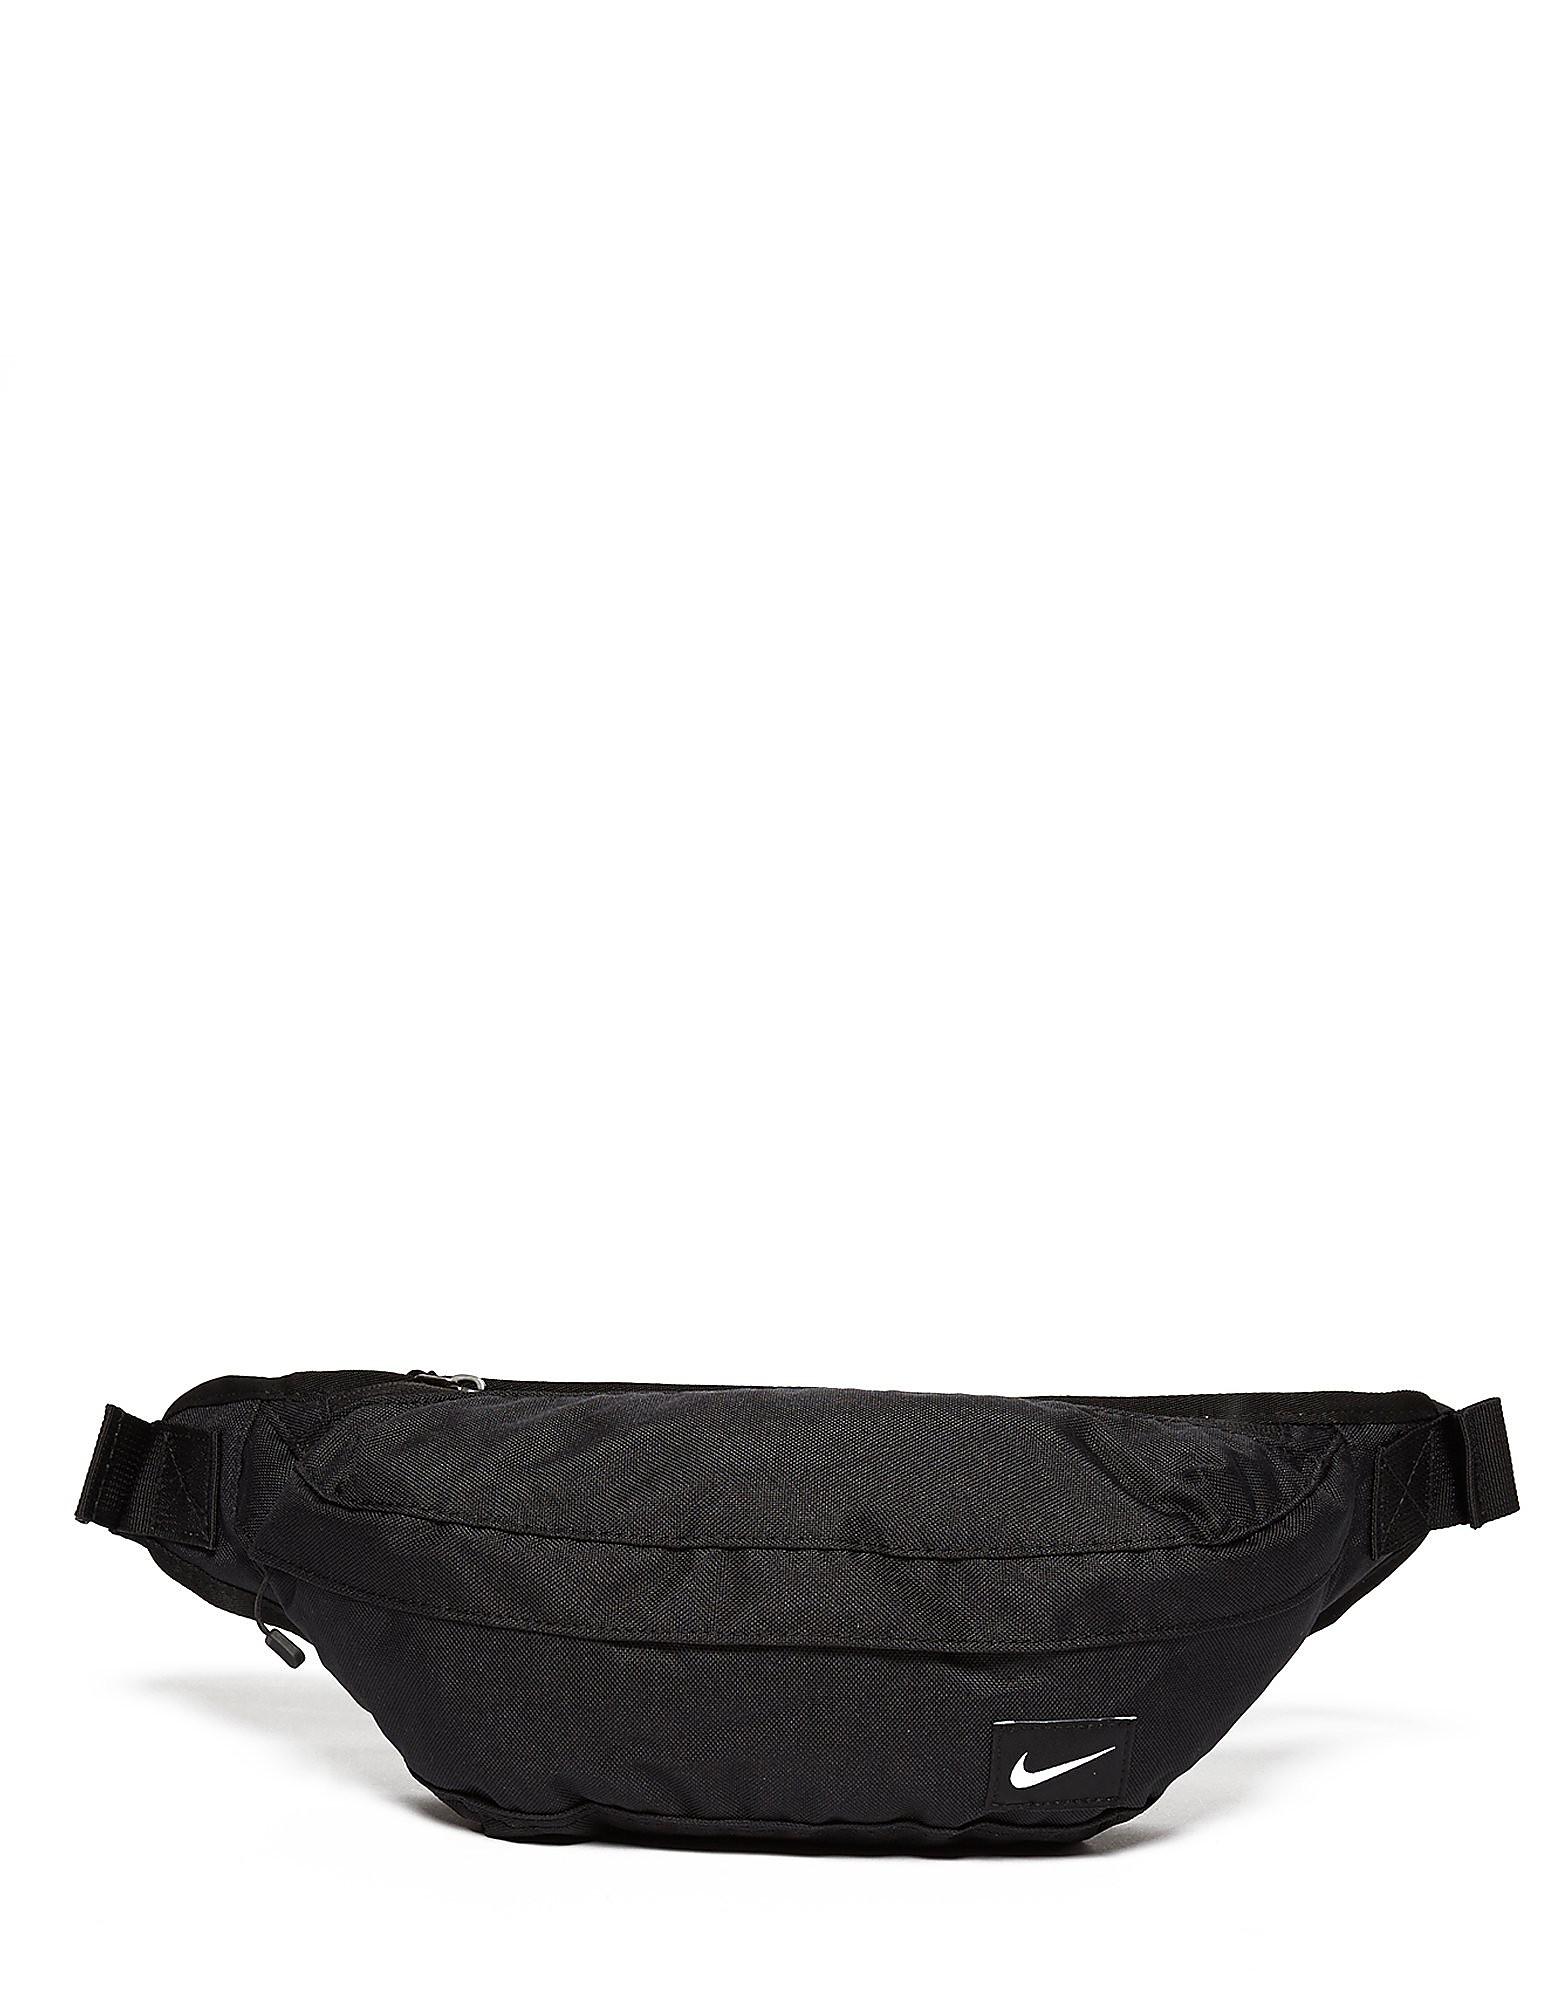 Nike Hood Waistpack - Black - Mens, Black